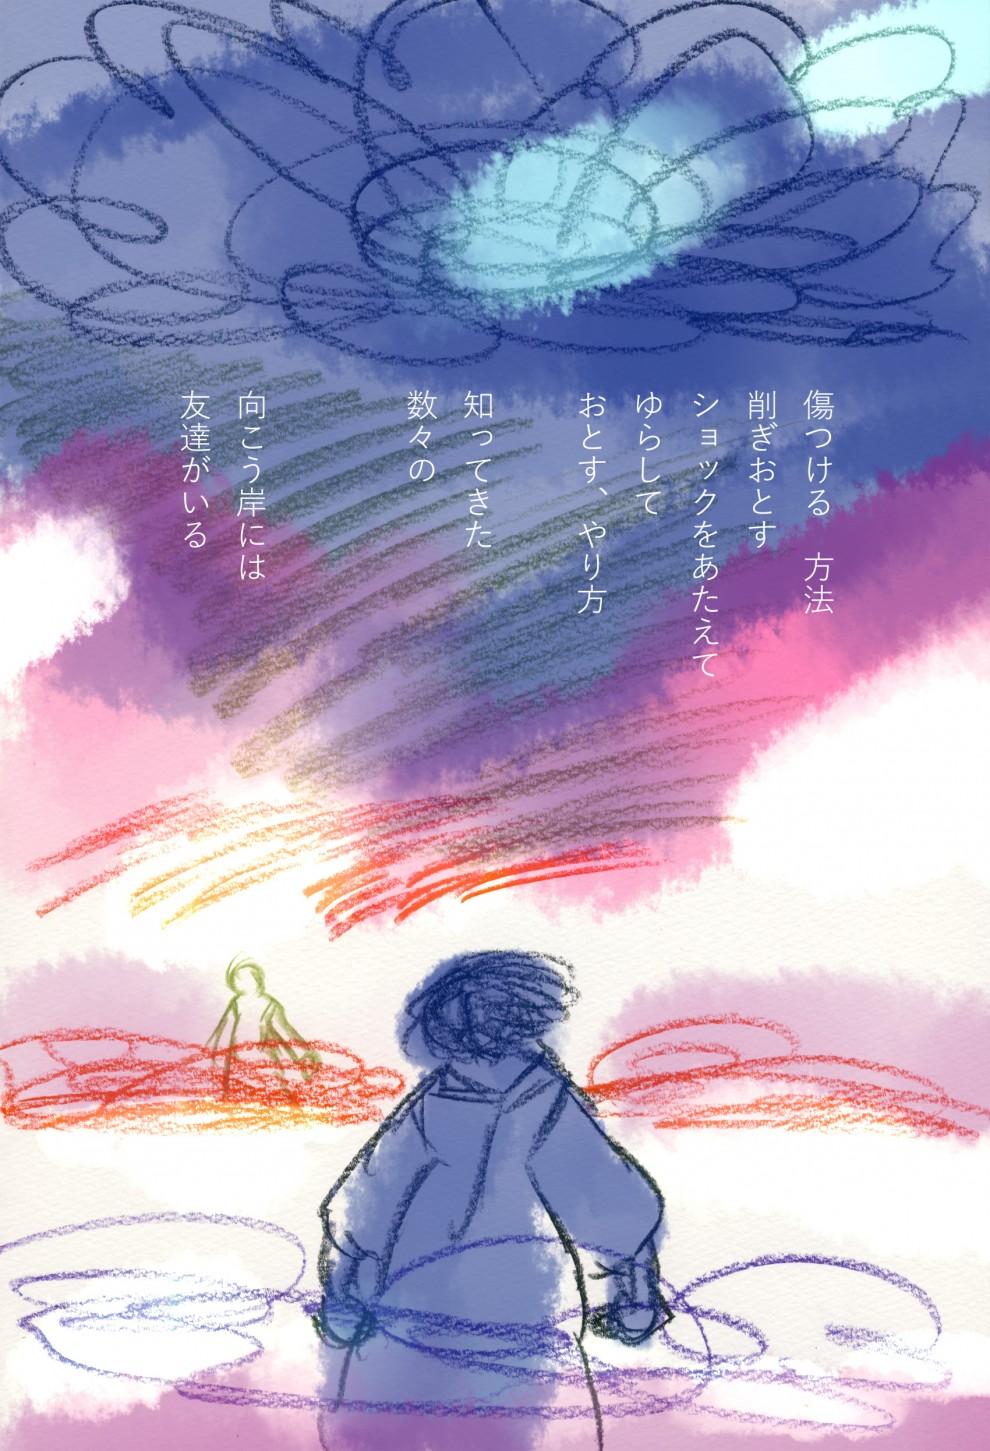 http://ahito.com/comic/ehon/voice/img//2017/20171123_2/02.jpg